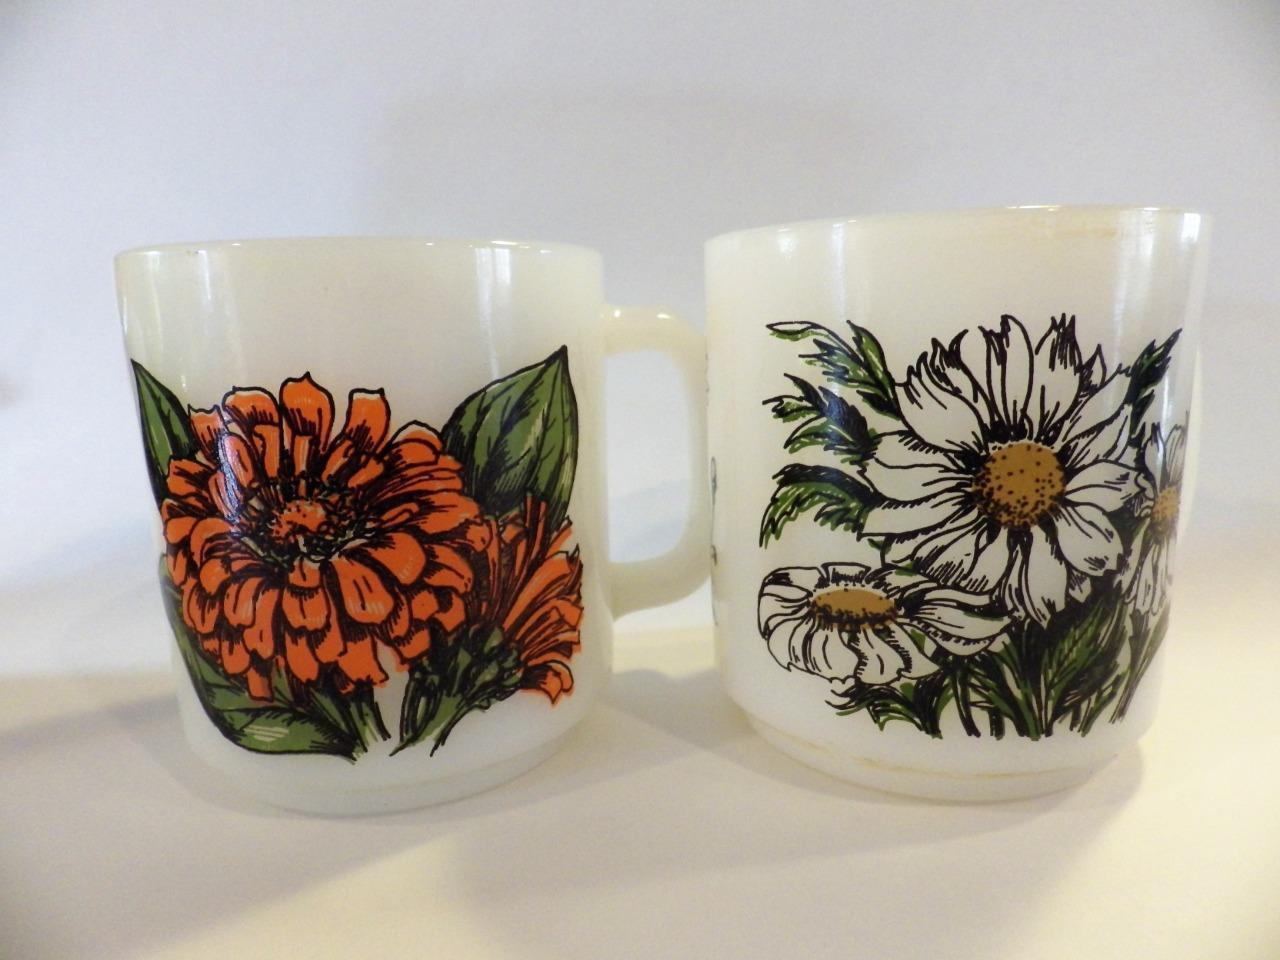 2 Glasbake Vintage Mugs Language Of Flowers And 50 Similar Items